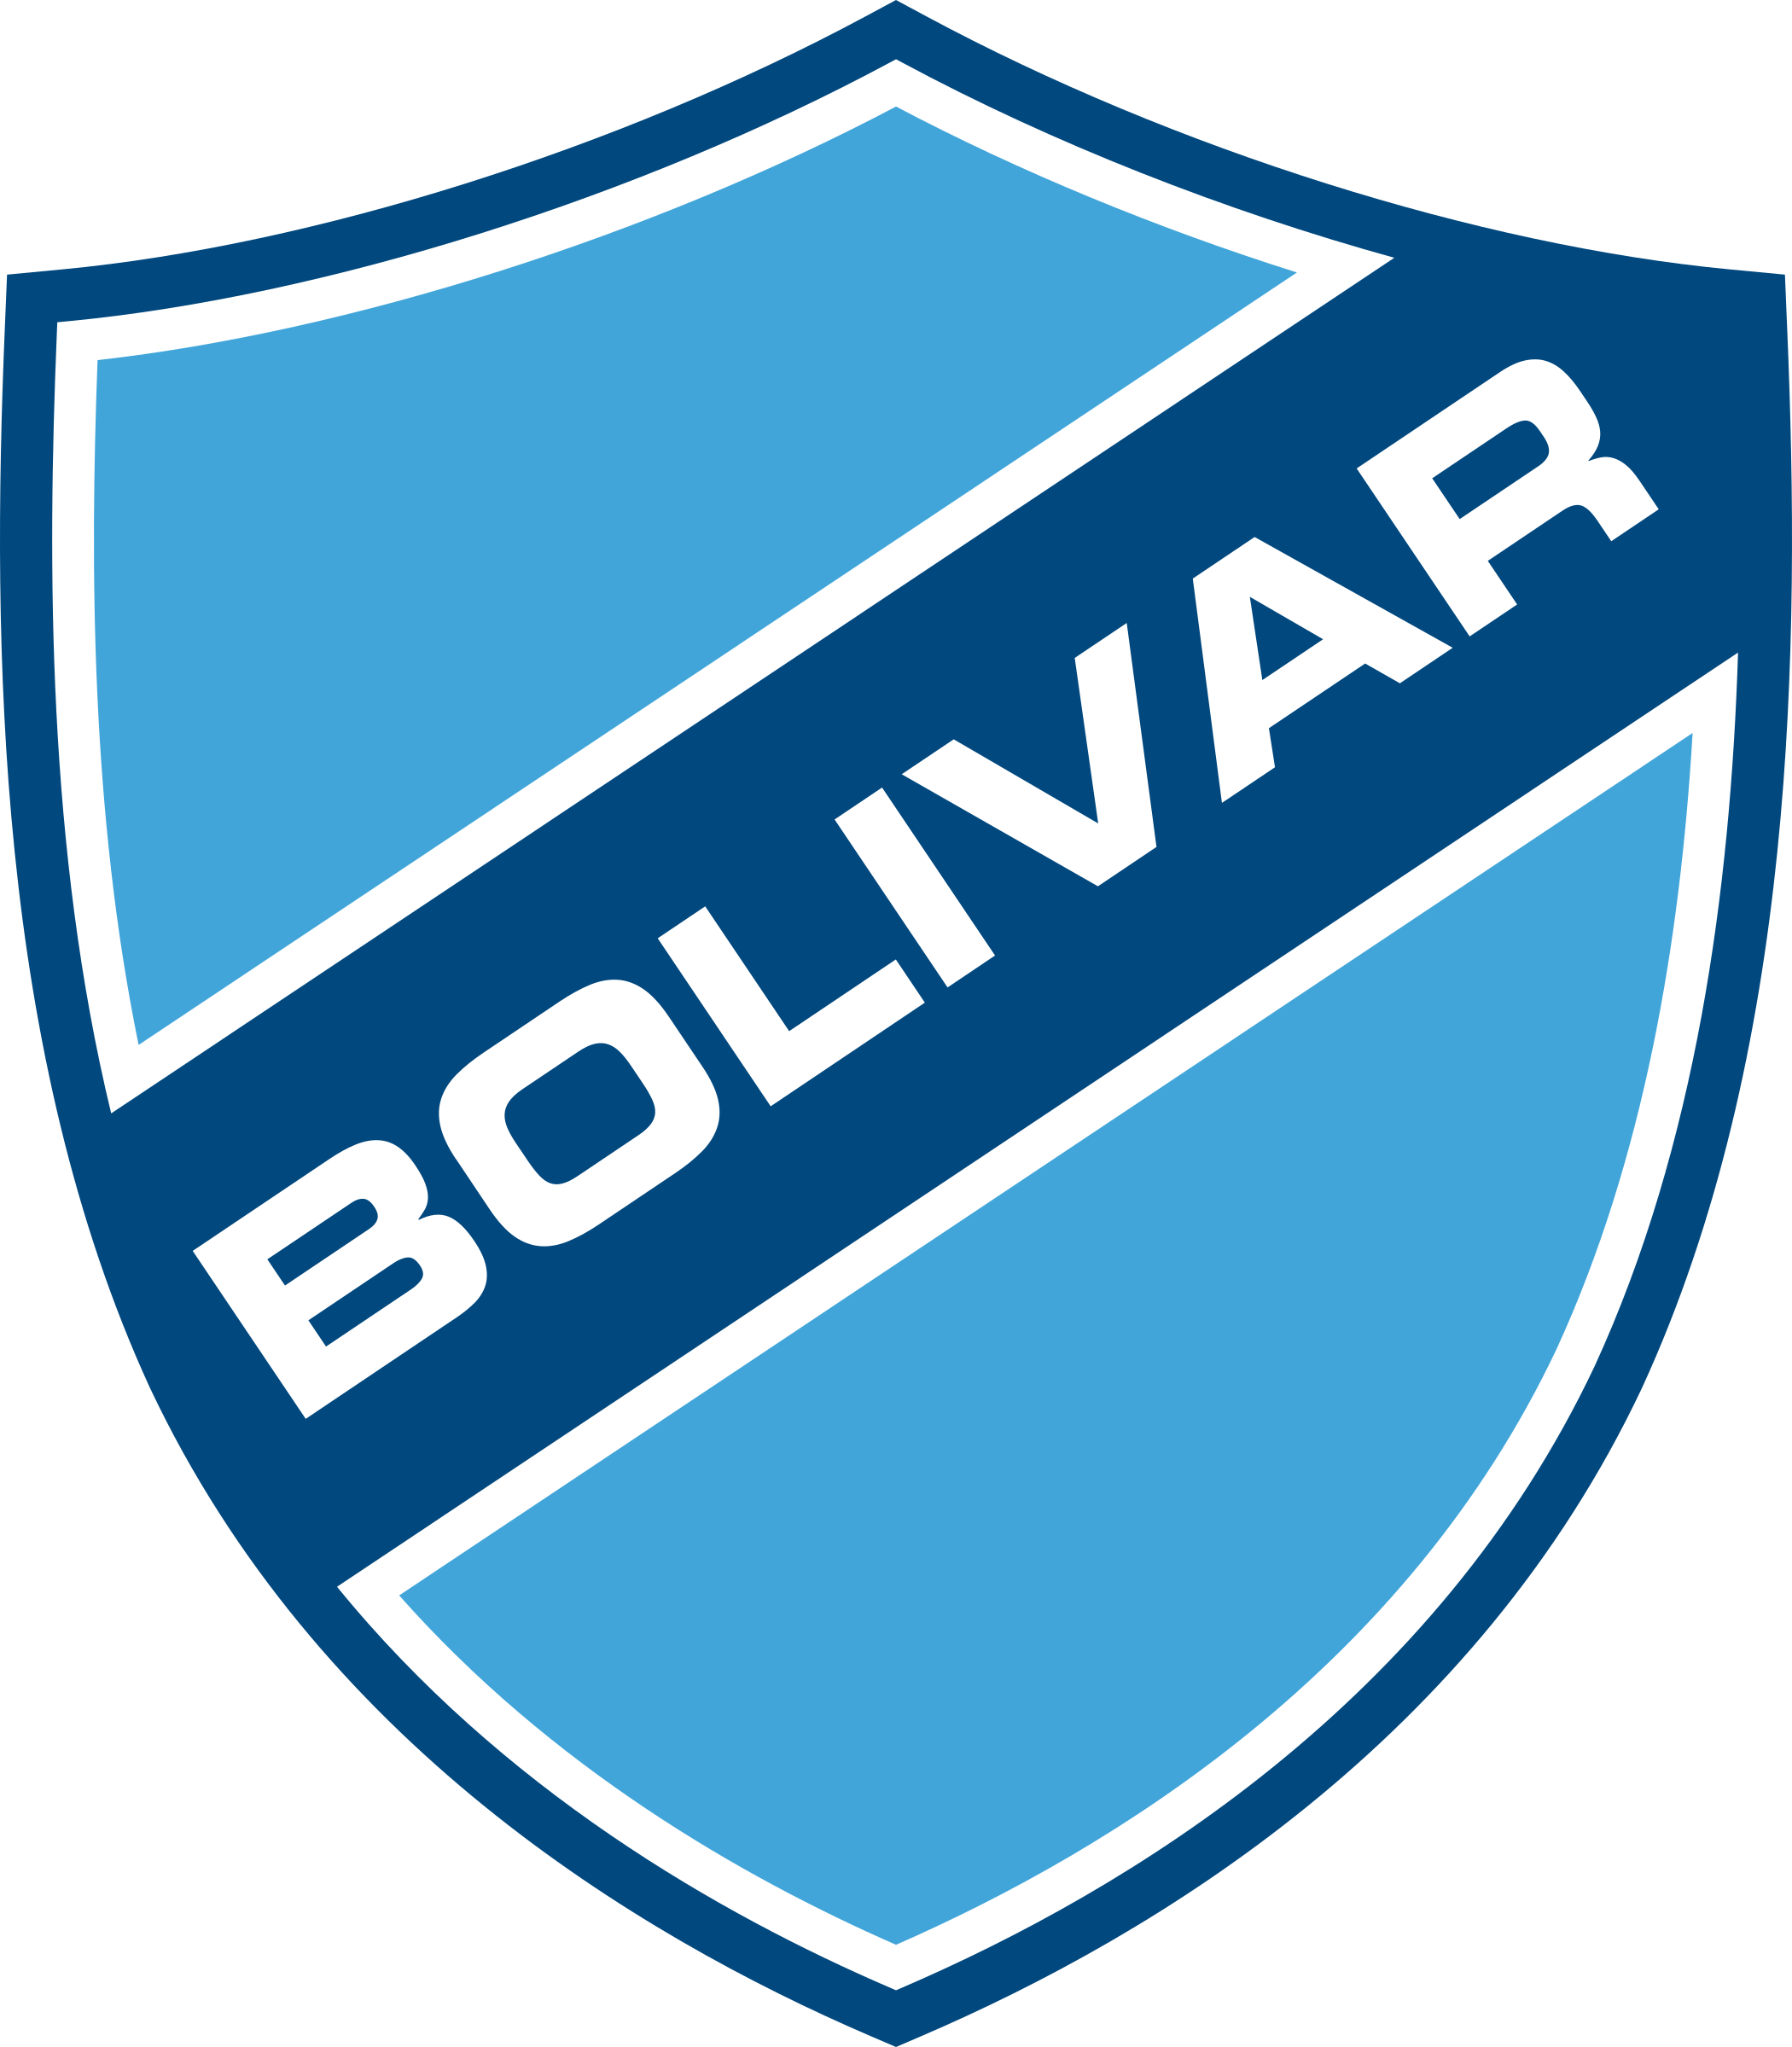 club bolívar logo 1 - Club Bolívar Logo - Escudo